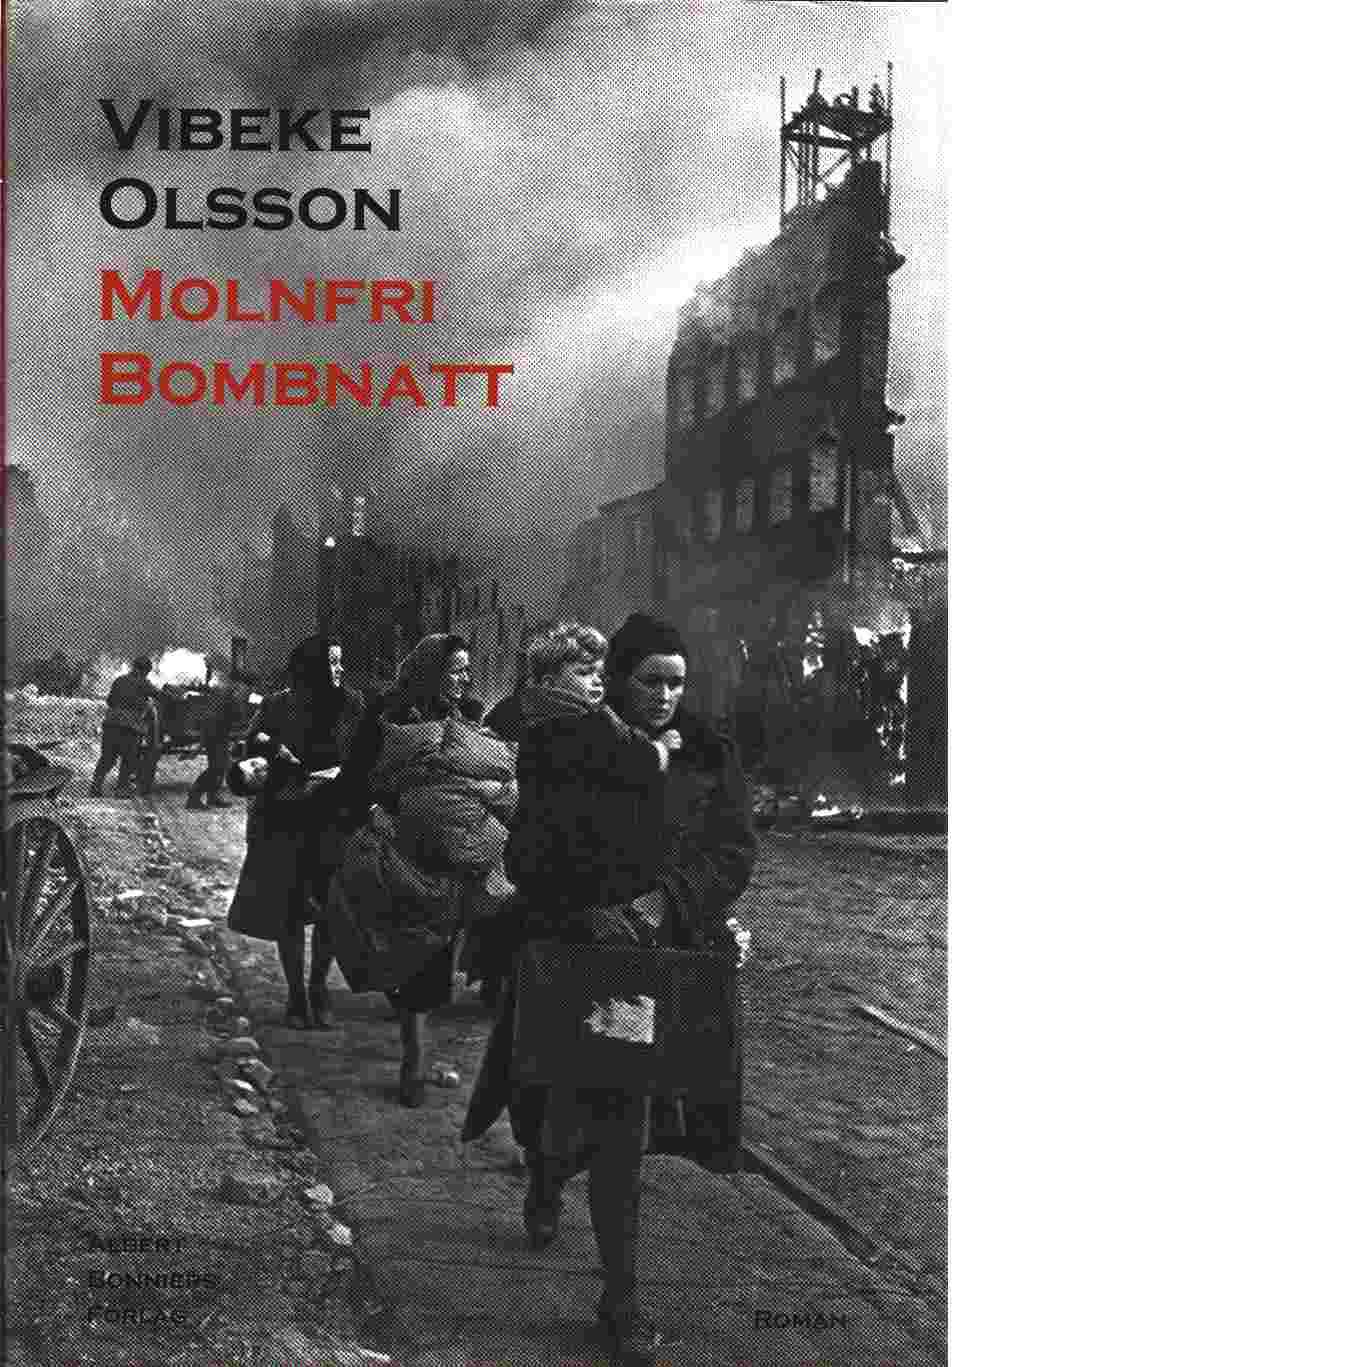 Molnfri bombnatt - Olsson, Vibeke